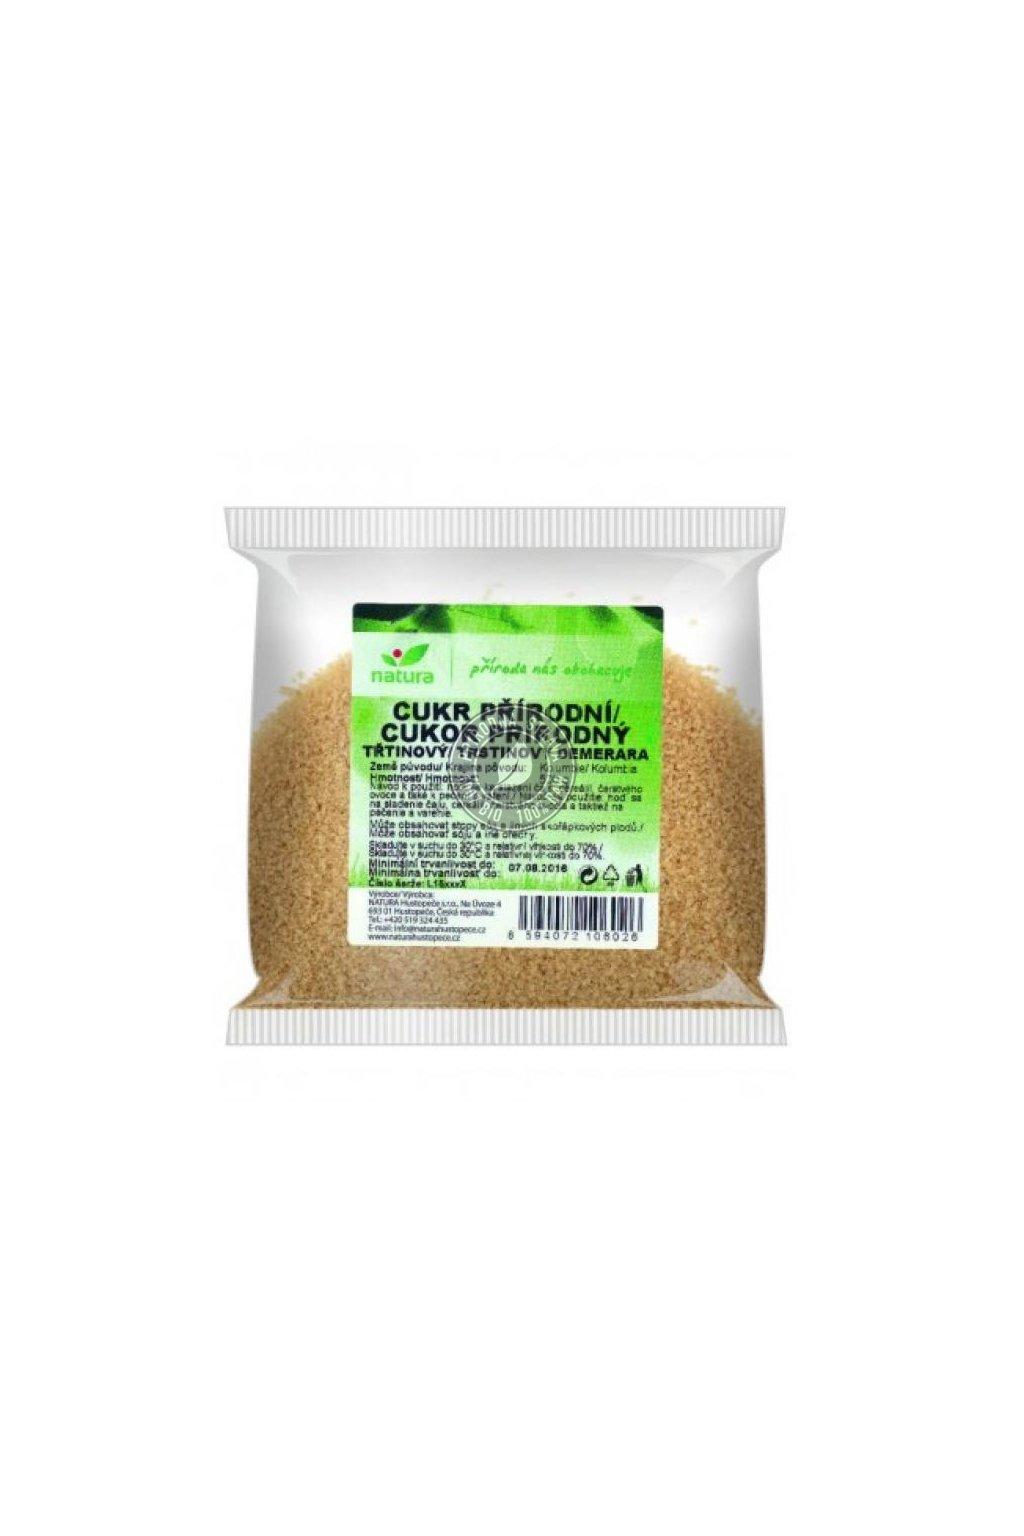 cukor trstinovy 500g 0